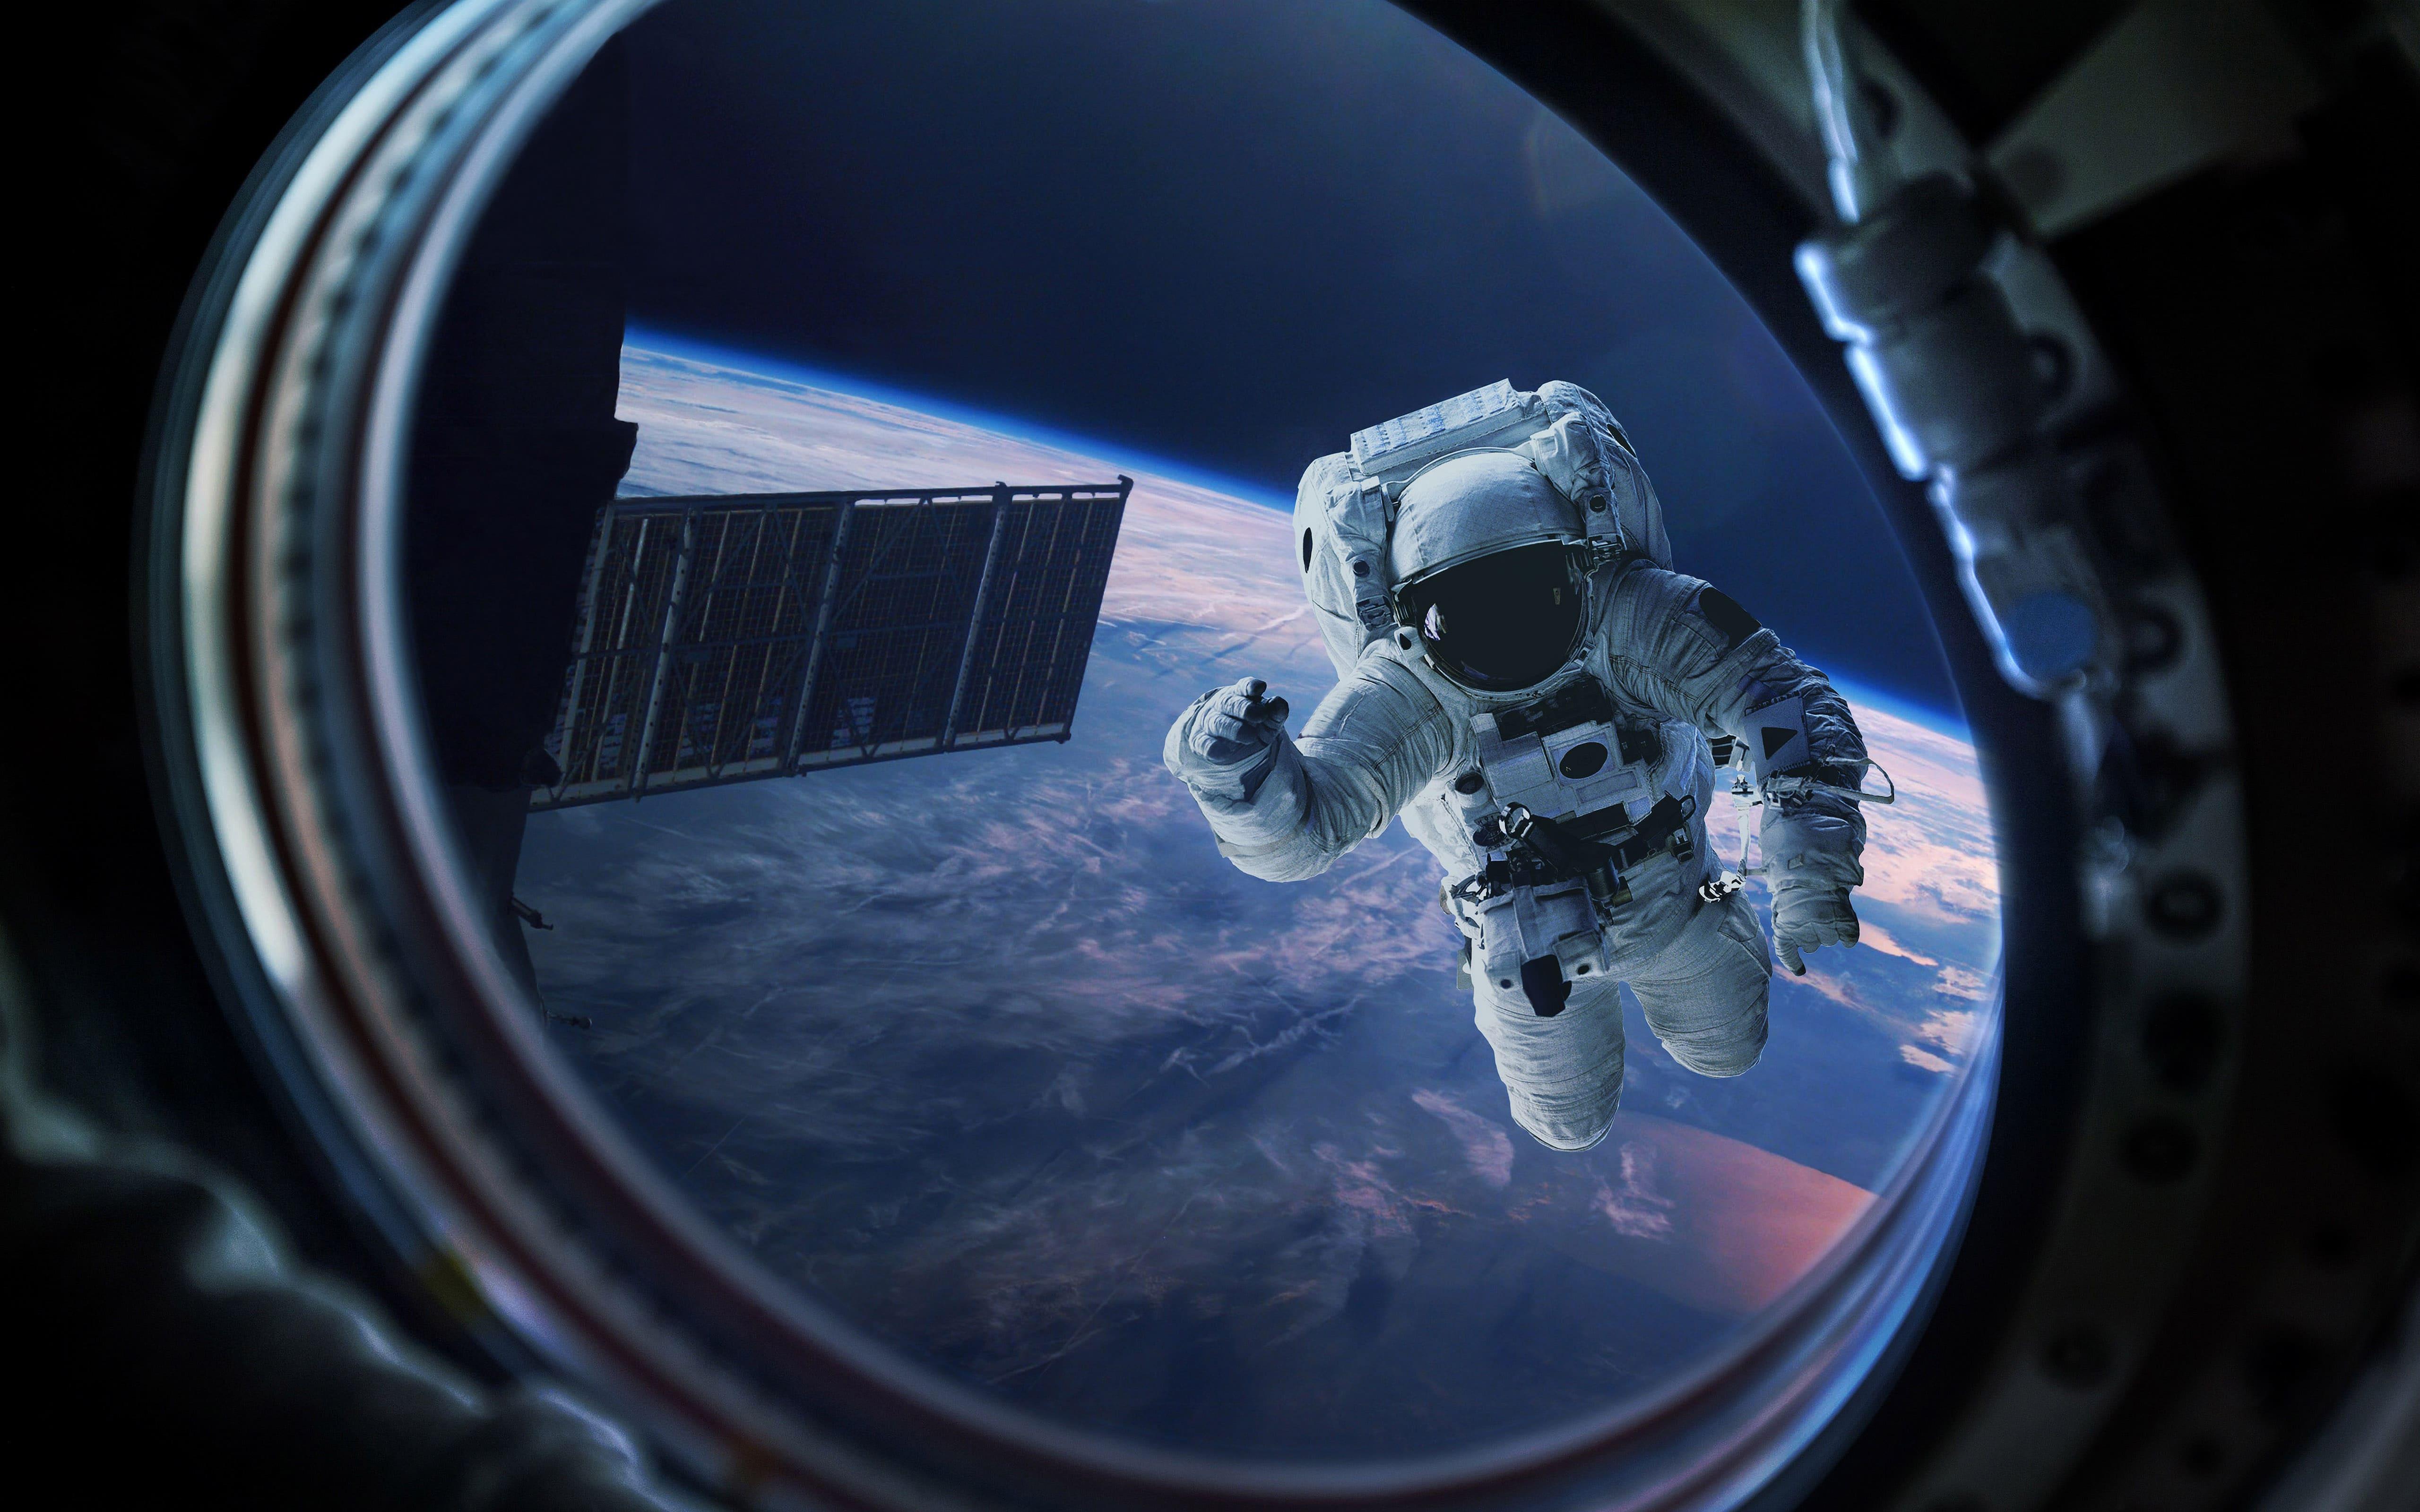 Астронавт в иллюминаторе из космоса, 5k ultra hd, 5120 на 3200 пикселей